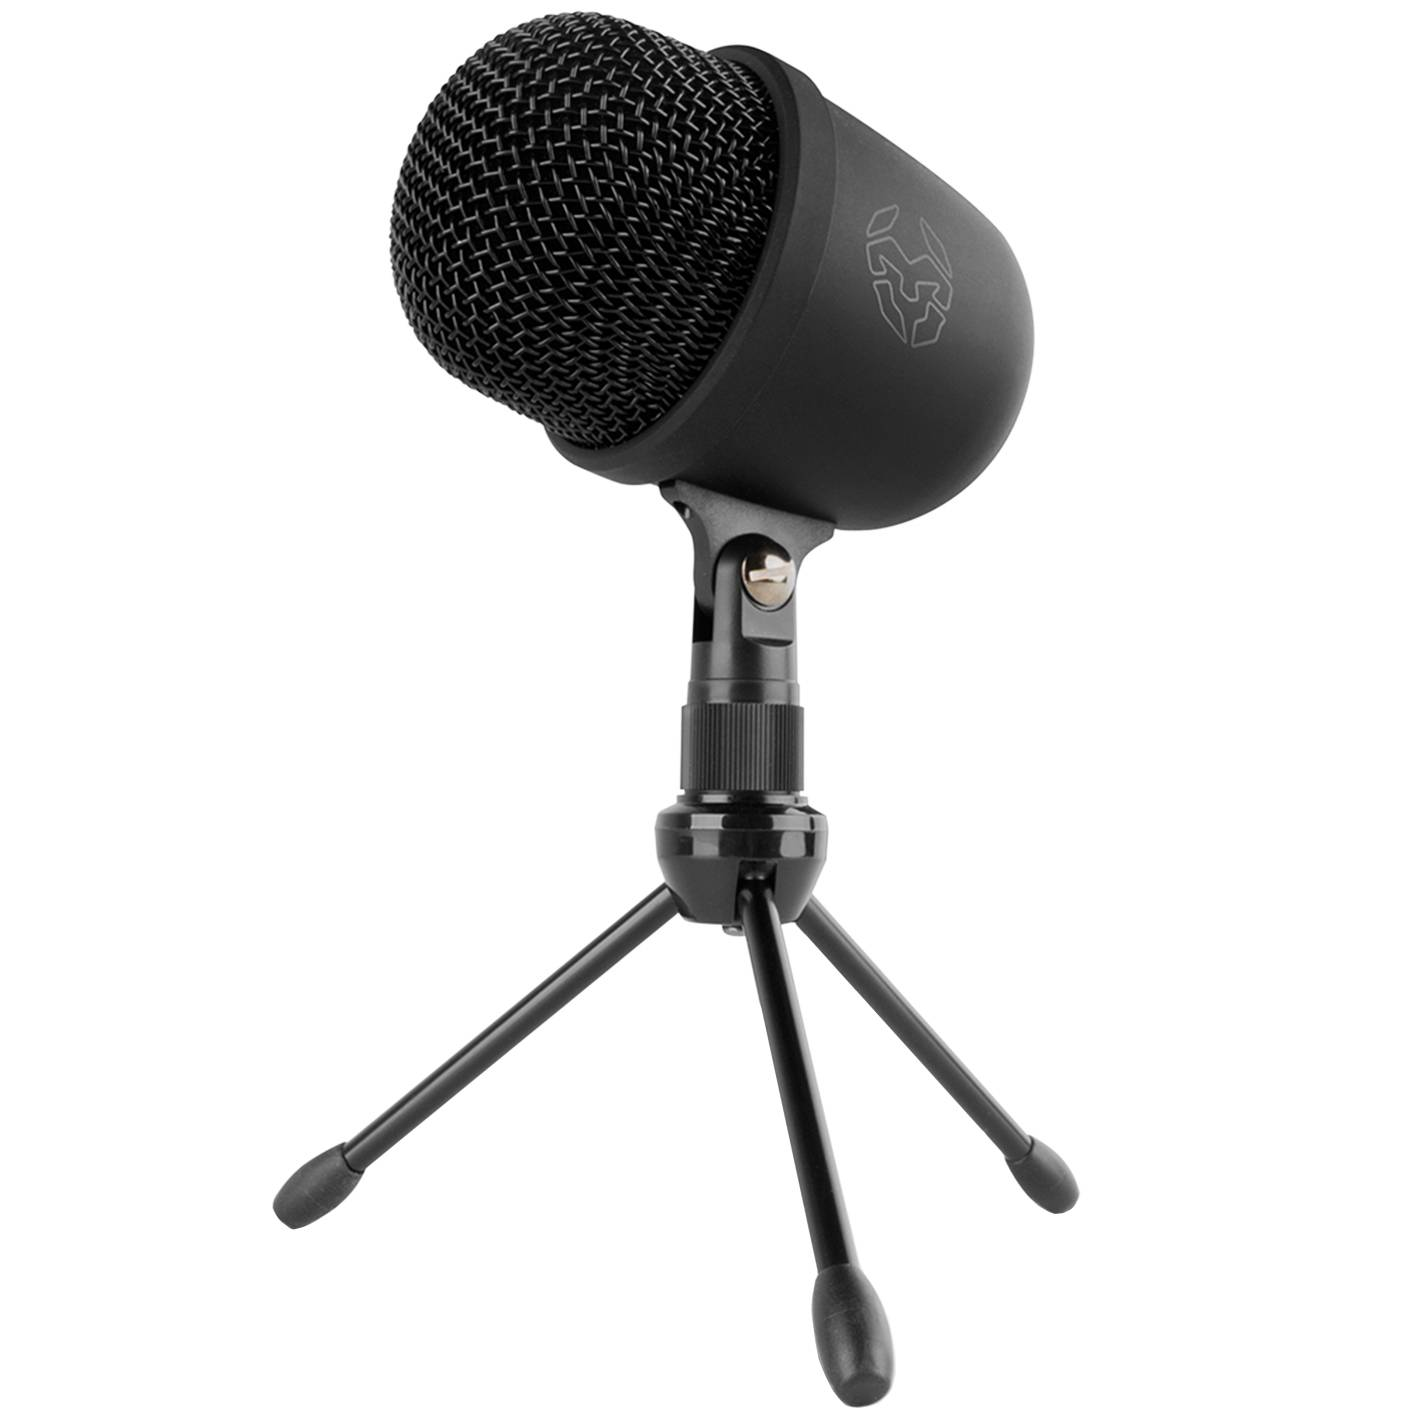 Krom Accesorio de Informática - Krom Kimu Pro PC microphone Negro